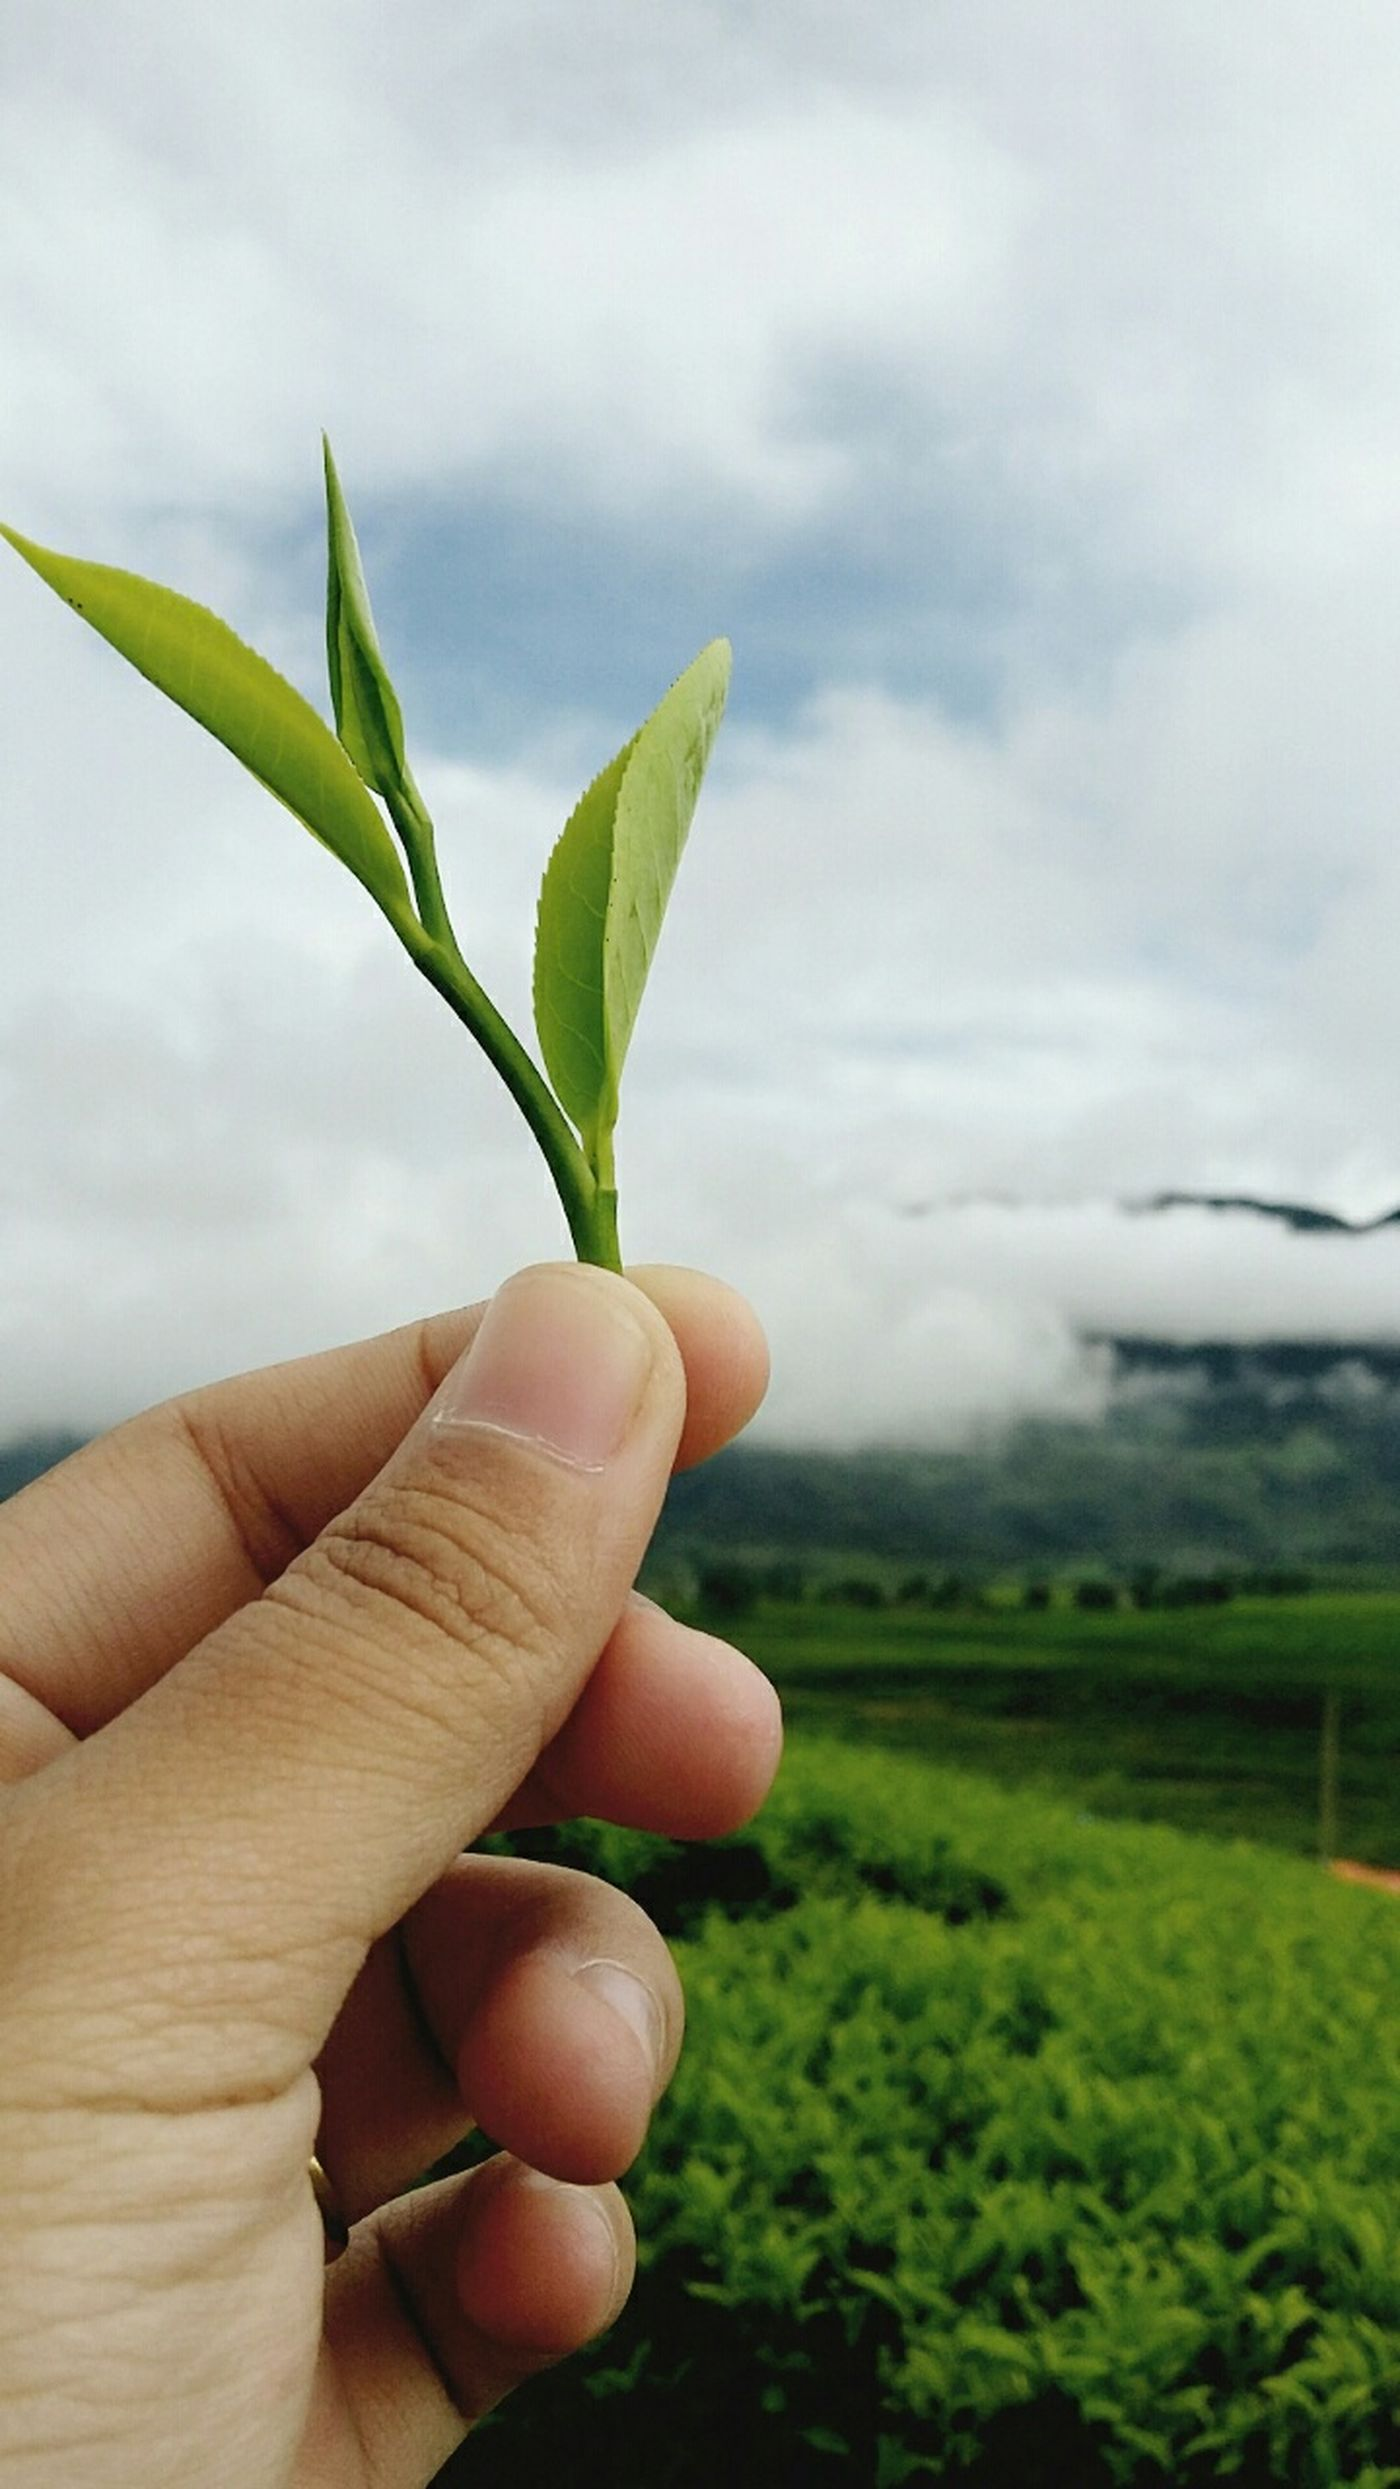 Explore Indonesia Padangsolok EyeEm Nature Lover The Potraitist - 2015 EyeEm Awards